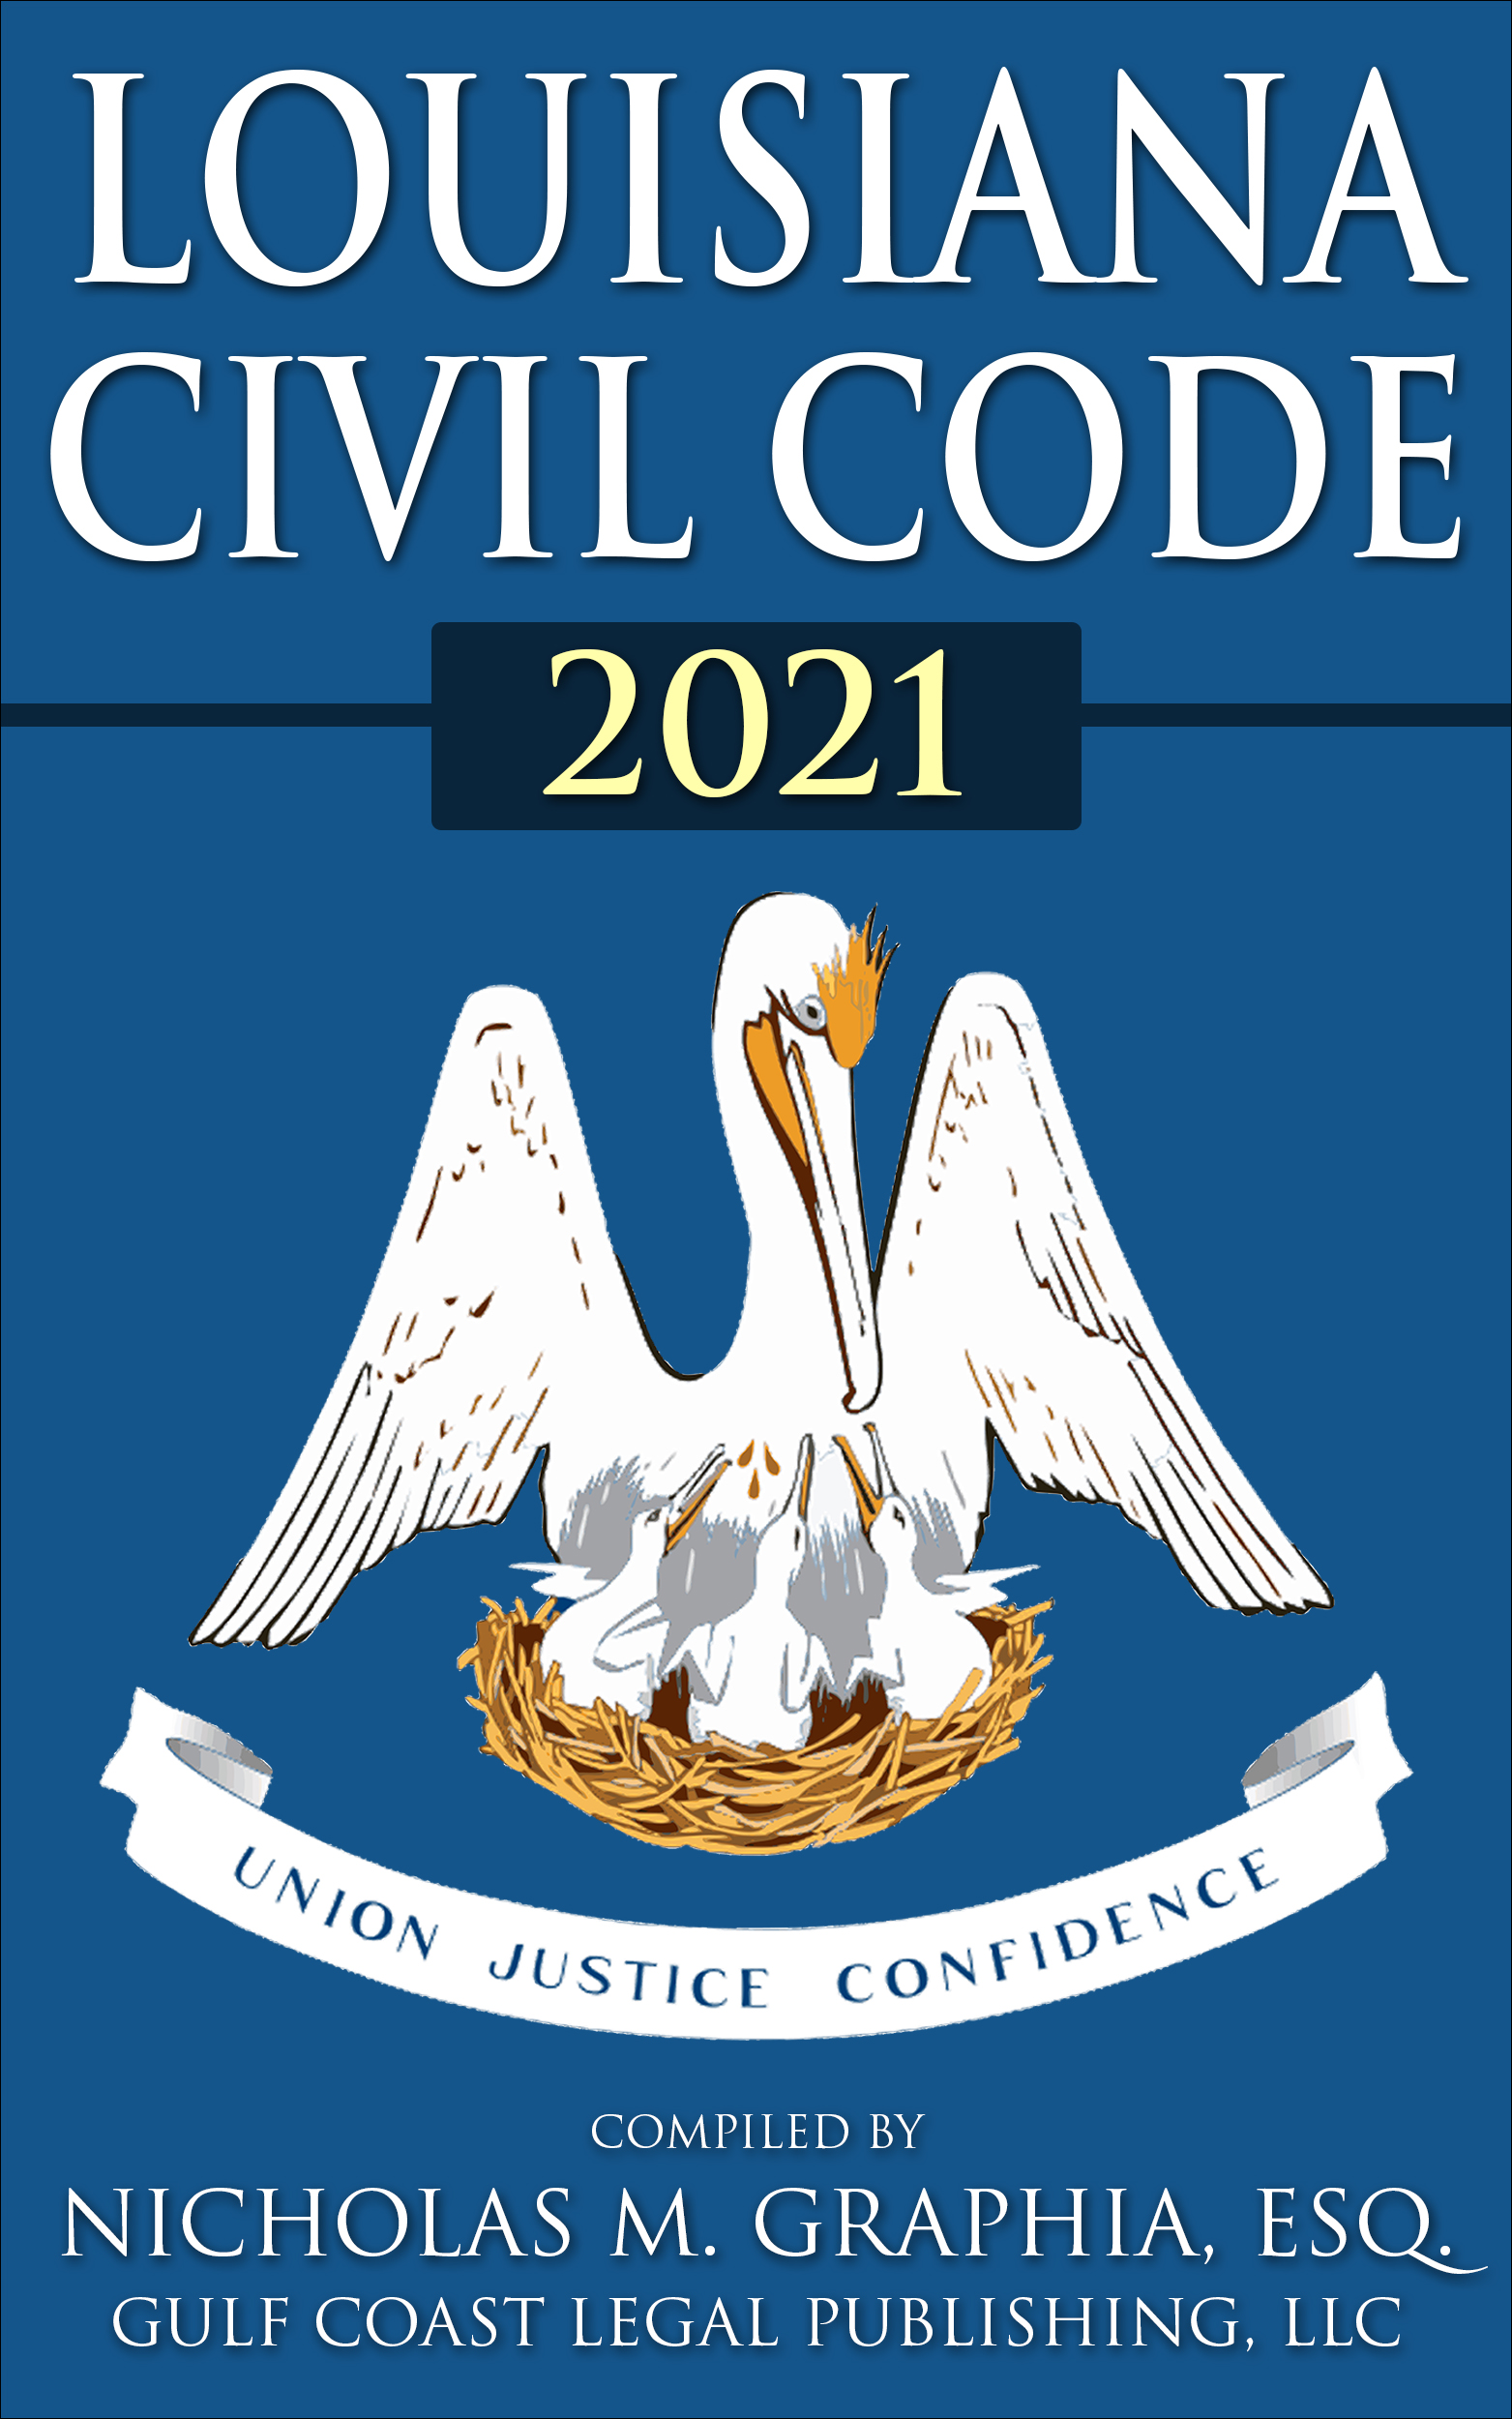 2021LouisianaCivilCodeEbookCover